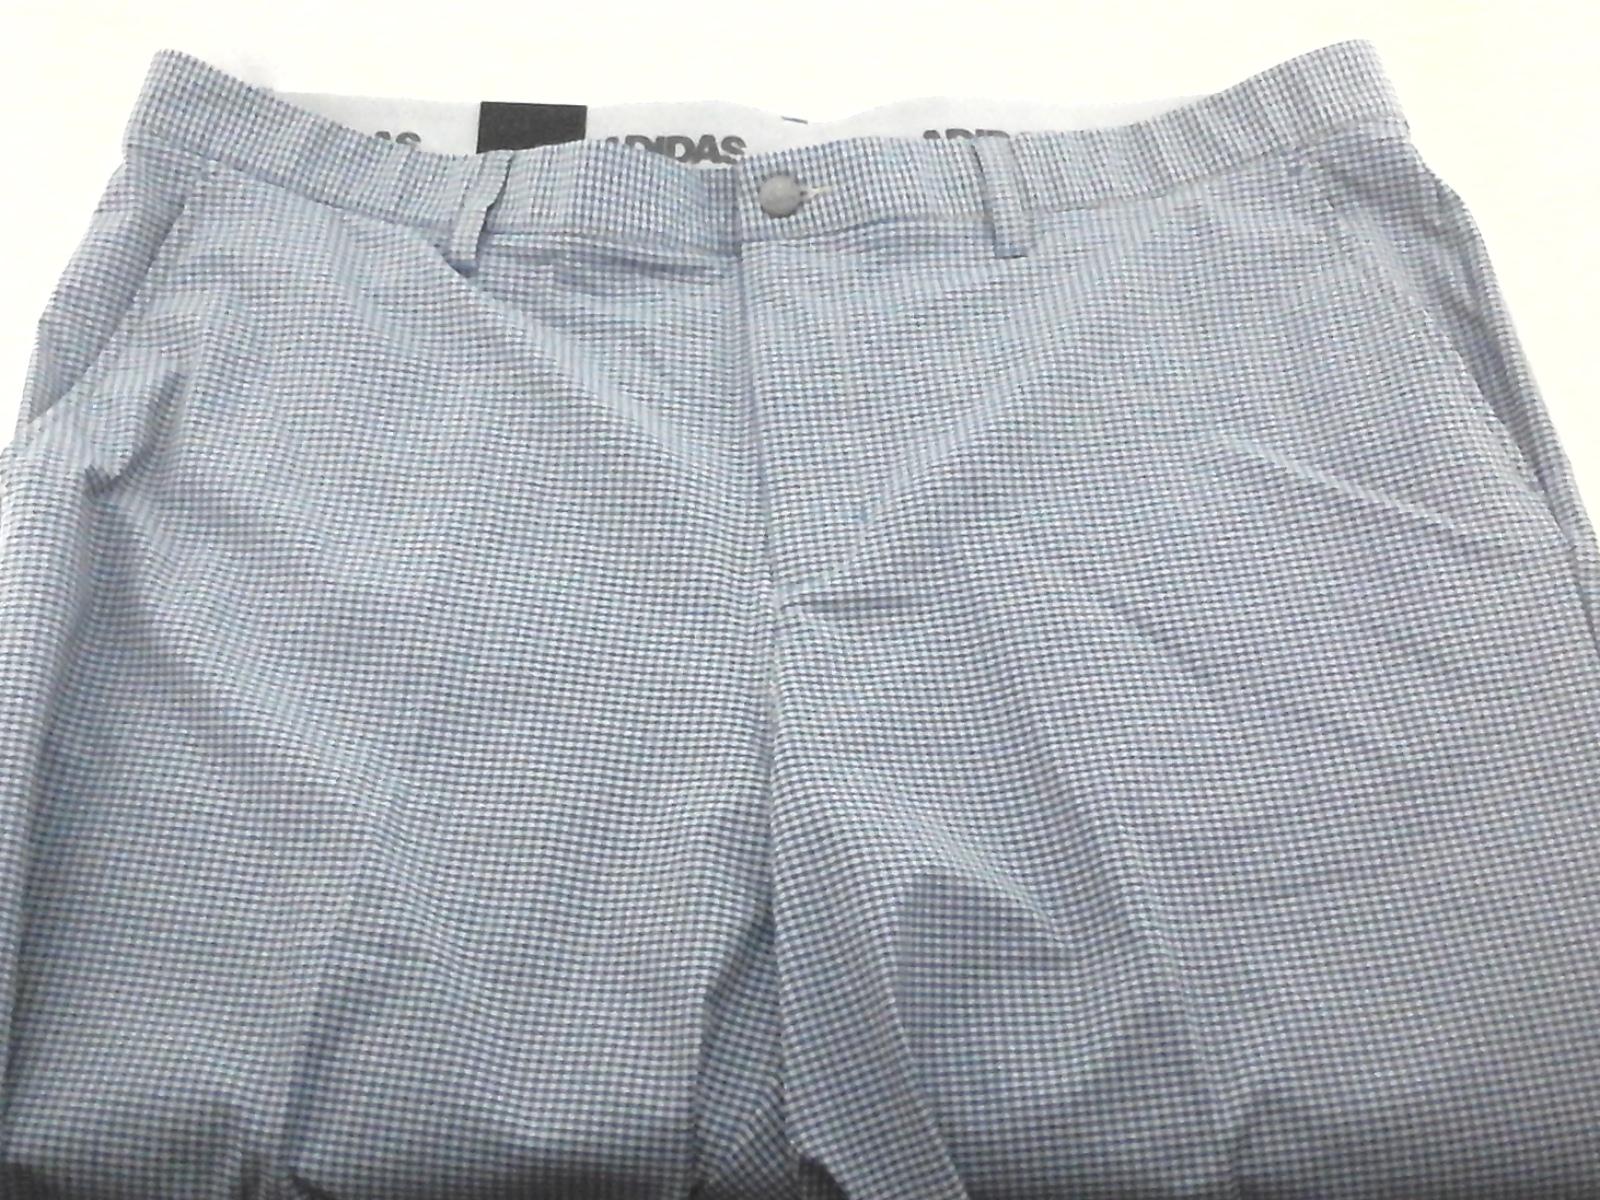 61efa83f ADIDAS Golf Shorts Blue Gray Gingham Ultimate 365 CD9884 Active ...